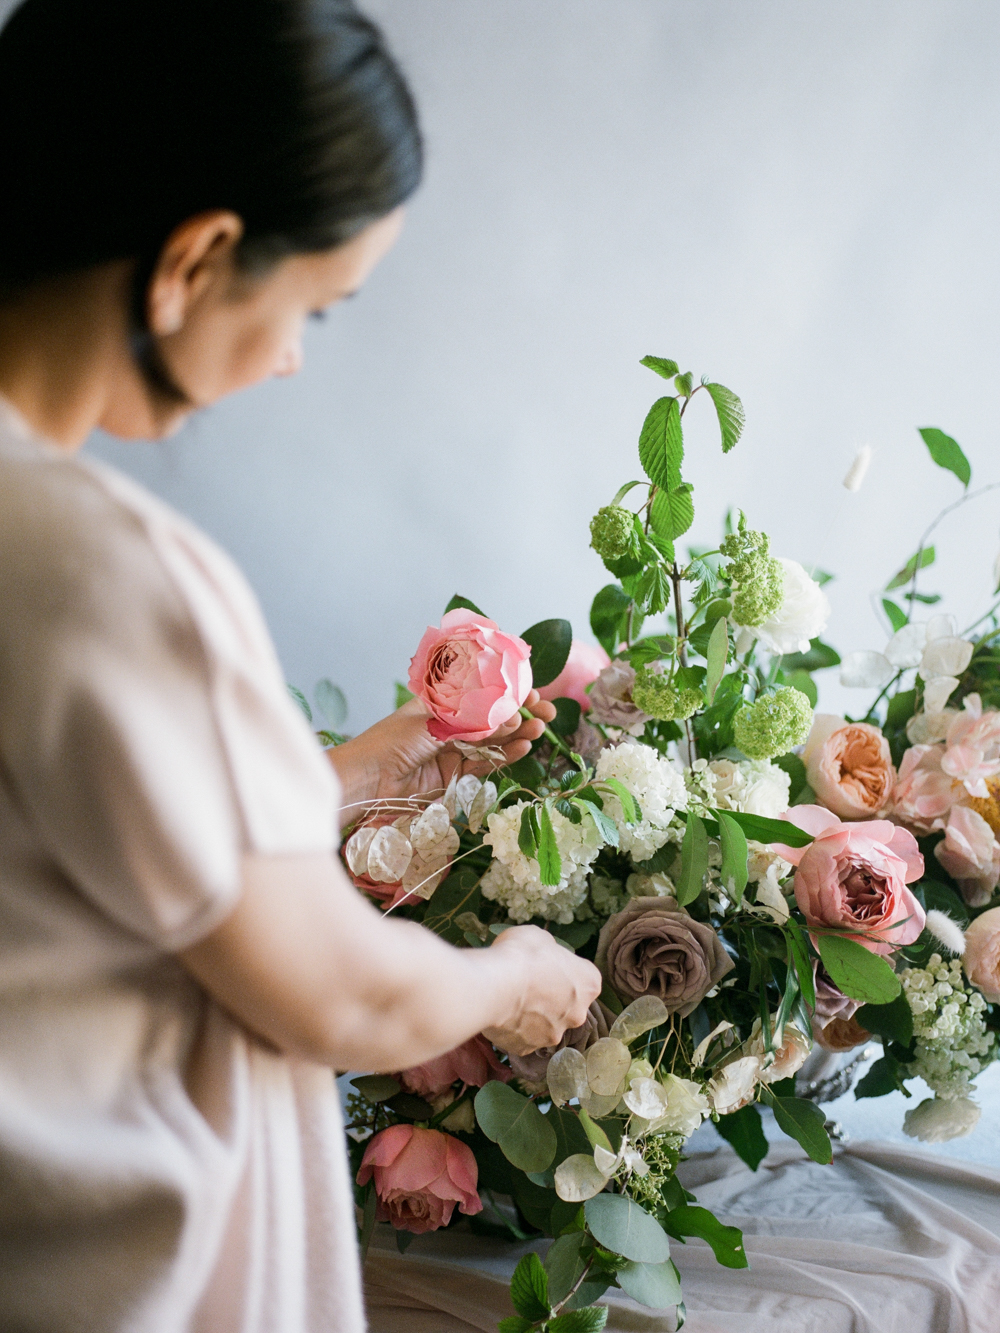 Christine Gosch - brand photographer - Maxit flower design - wedding florist-7.jpg